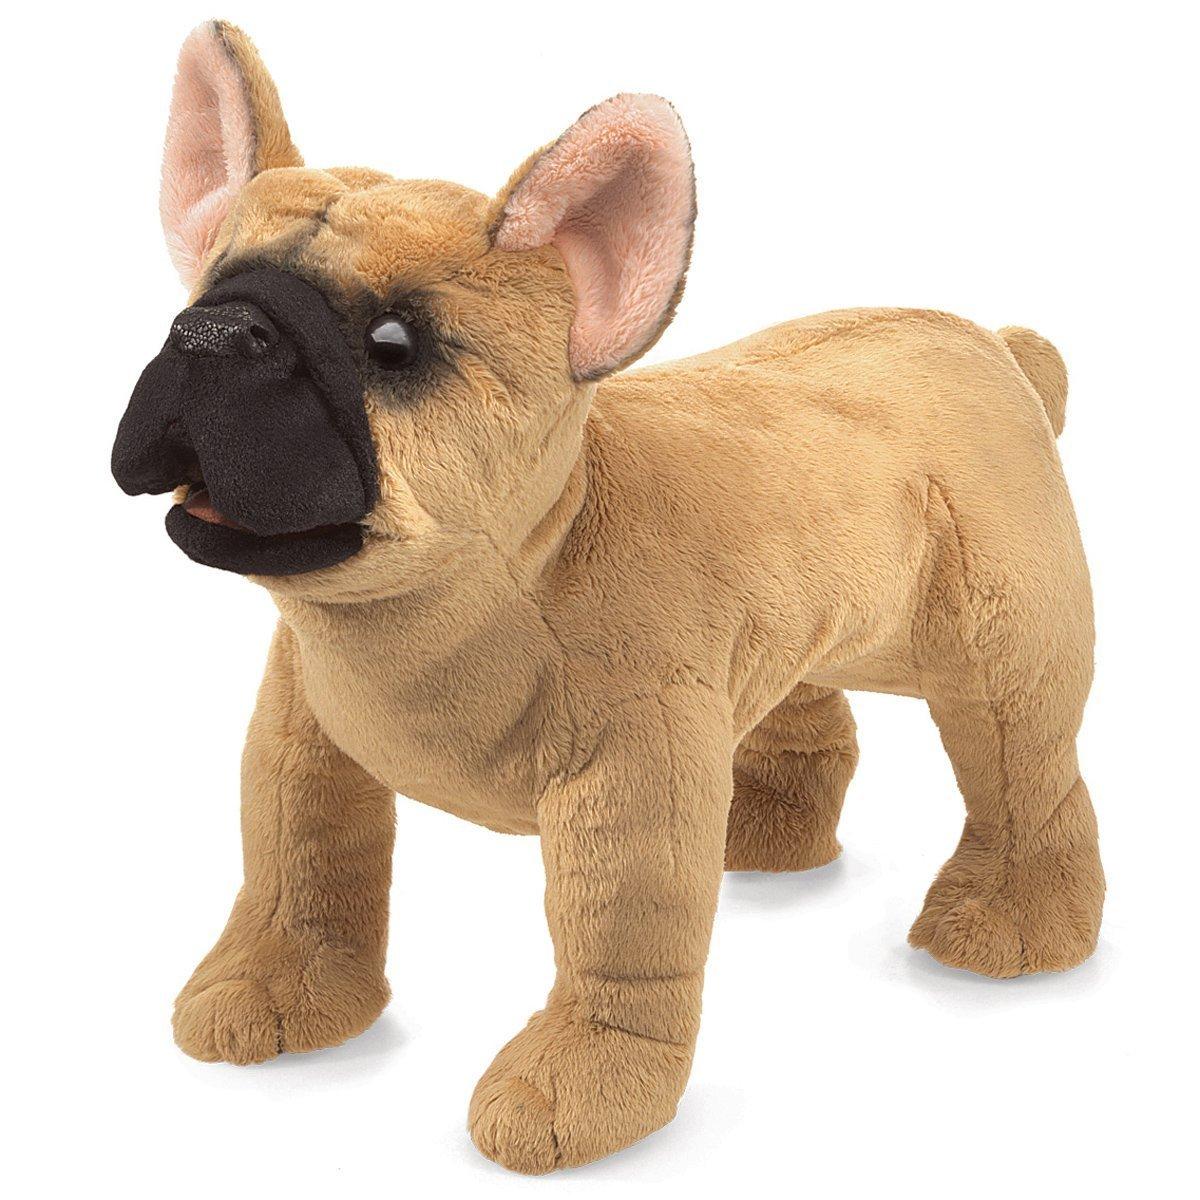 Folkmanis Hand Puppet - French Bulldog image